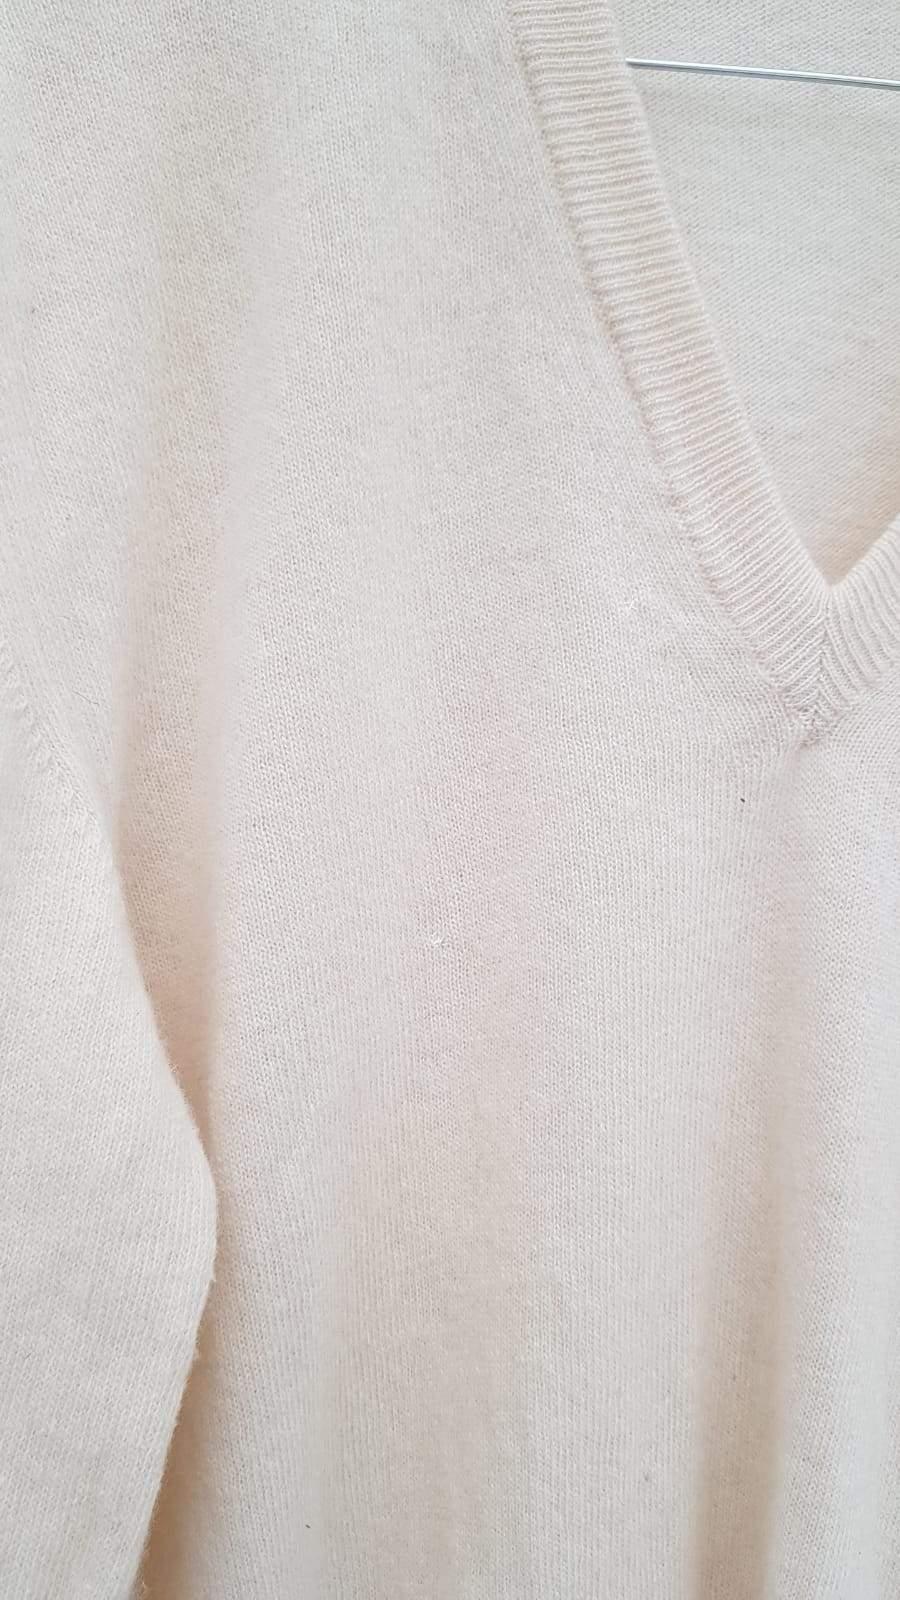 Pulls - Pull Yves Saint Laurent